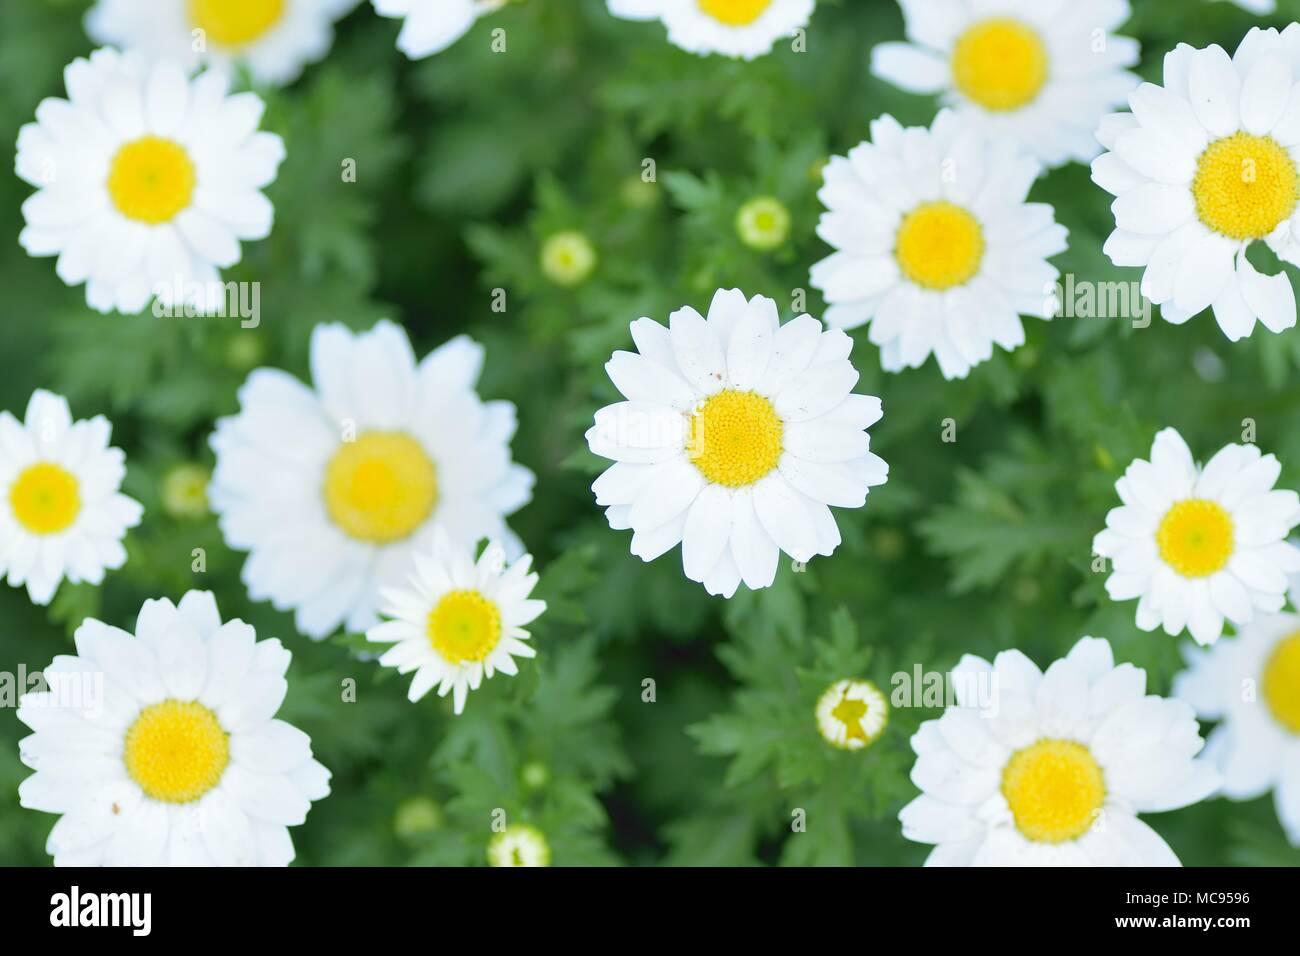 Macro Details Of White Daisy Flowers In Horizontal Frame Stock Photo